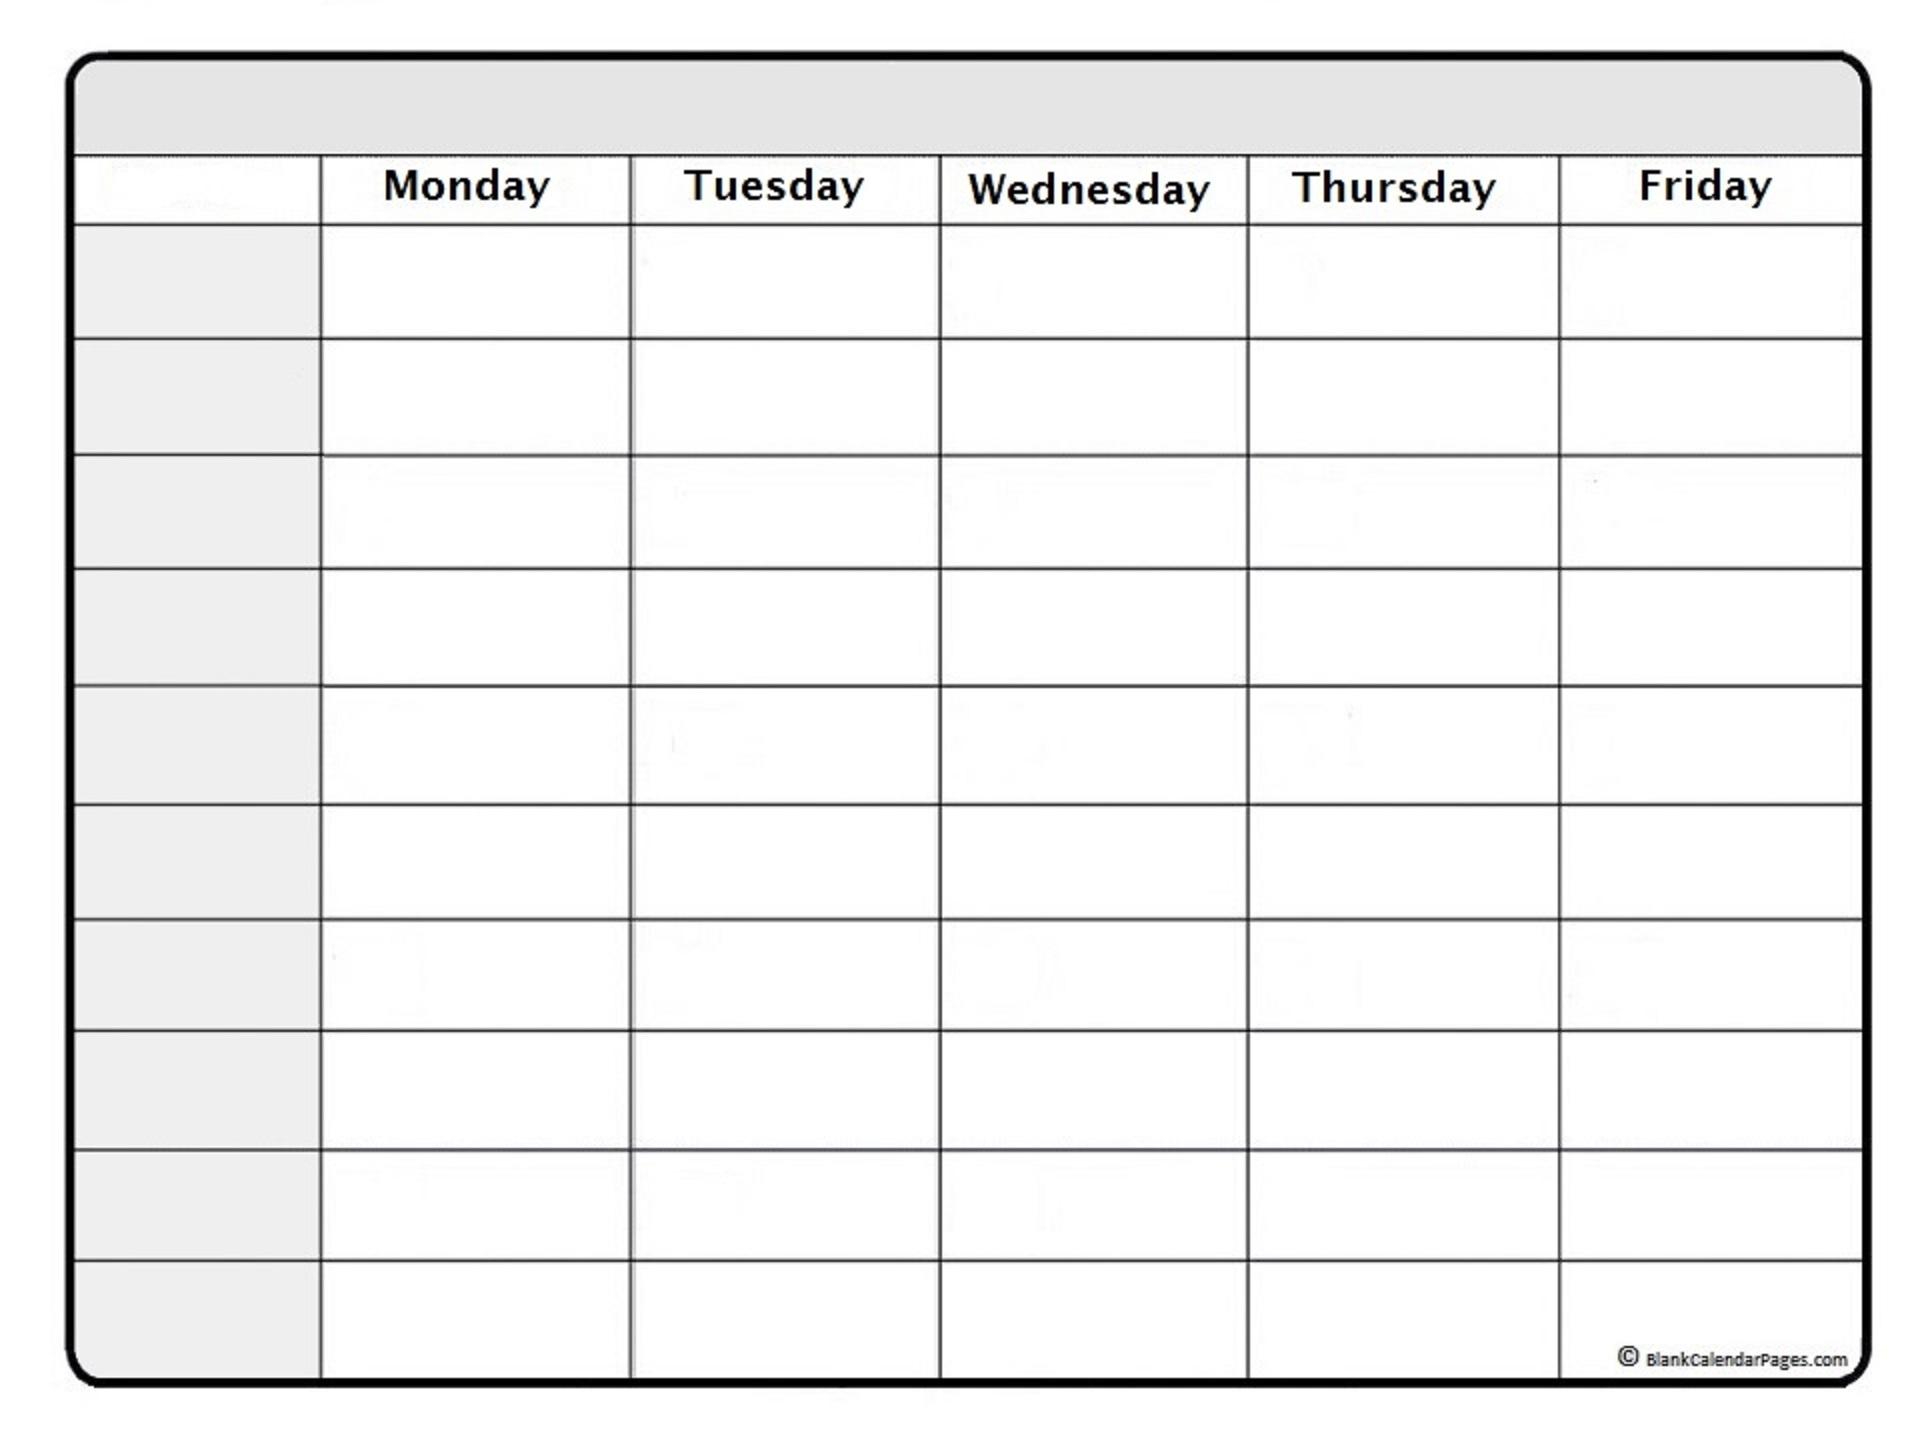 May 2019 Weekly Calendar | May 2019 Weekly Calendar Template throughout Printable Blank Weekly Calendars Templates